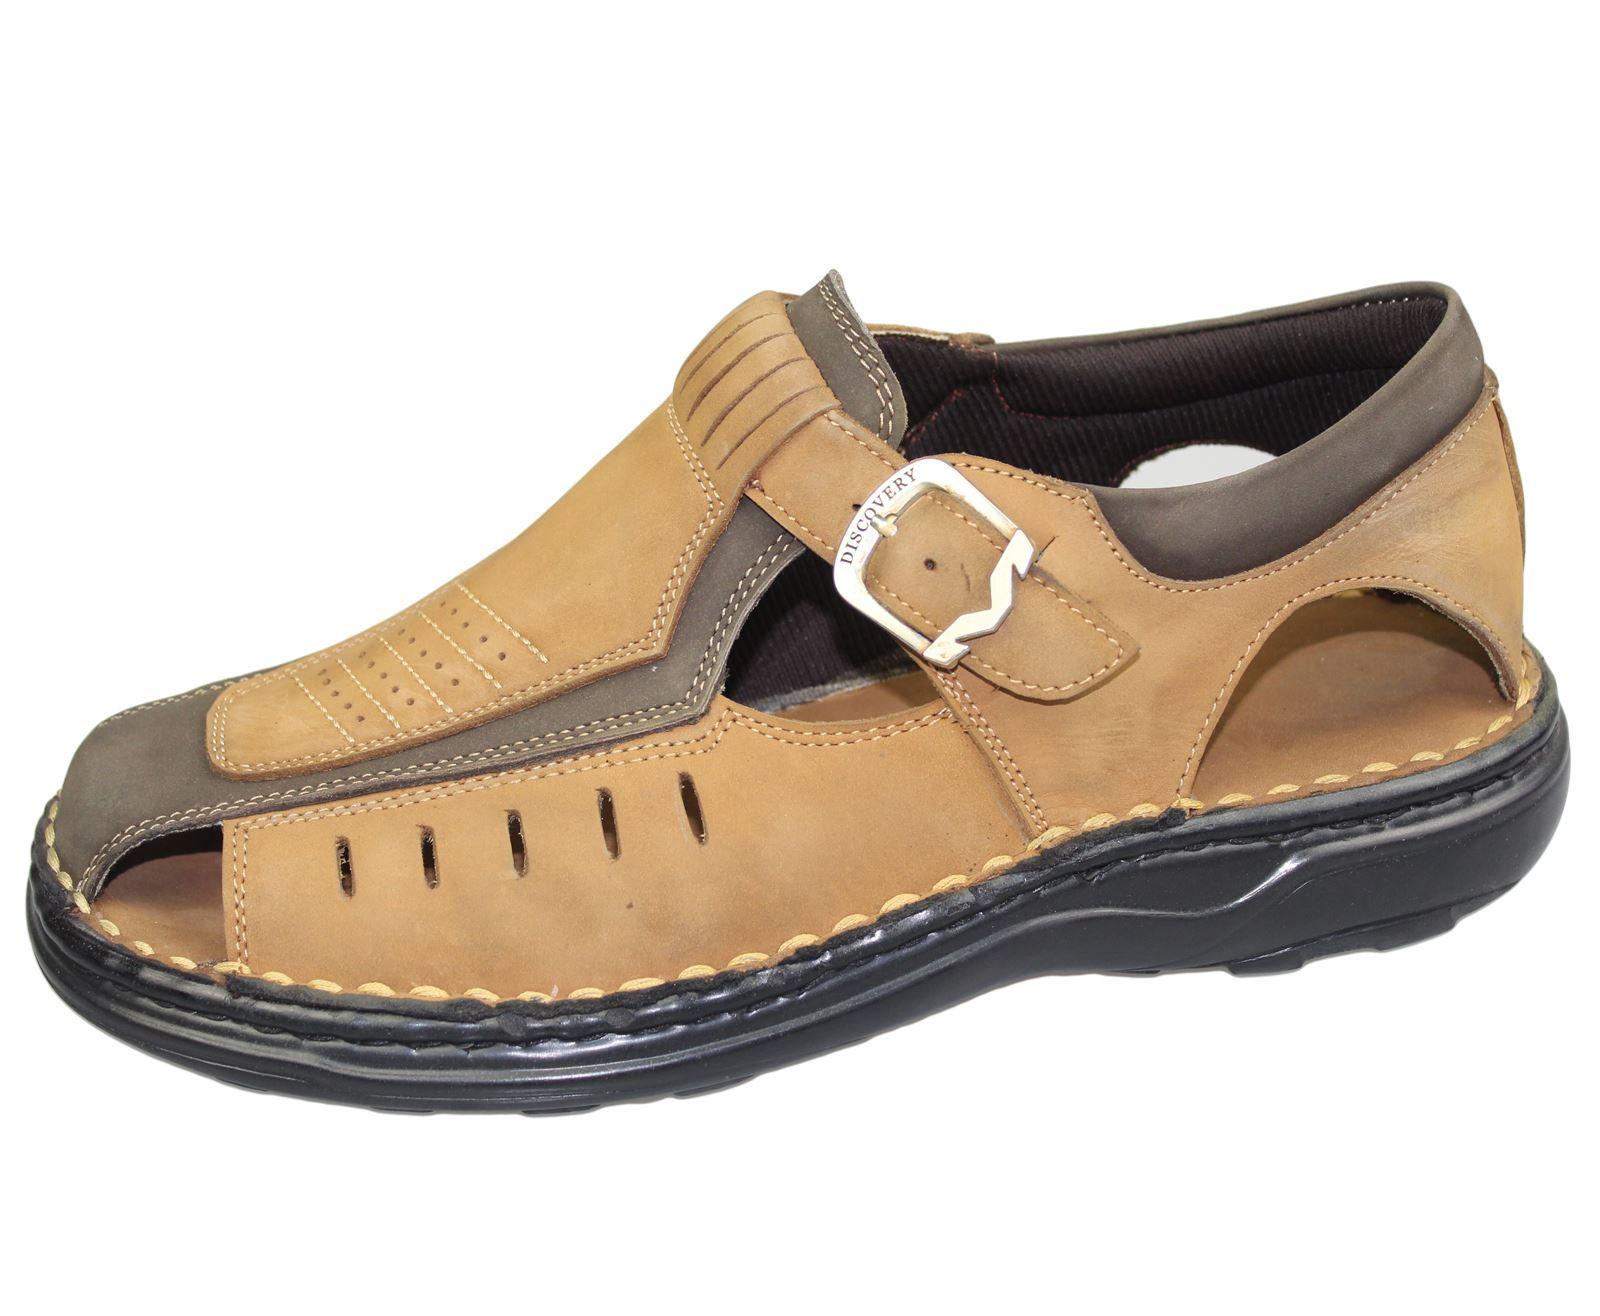 Mens-Buckle-Fastening-Sandals-Flat-Beach-Walking-Fashion-Casual-Summer-Slipper miniatura 3